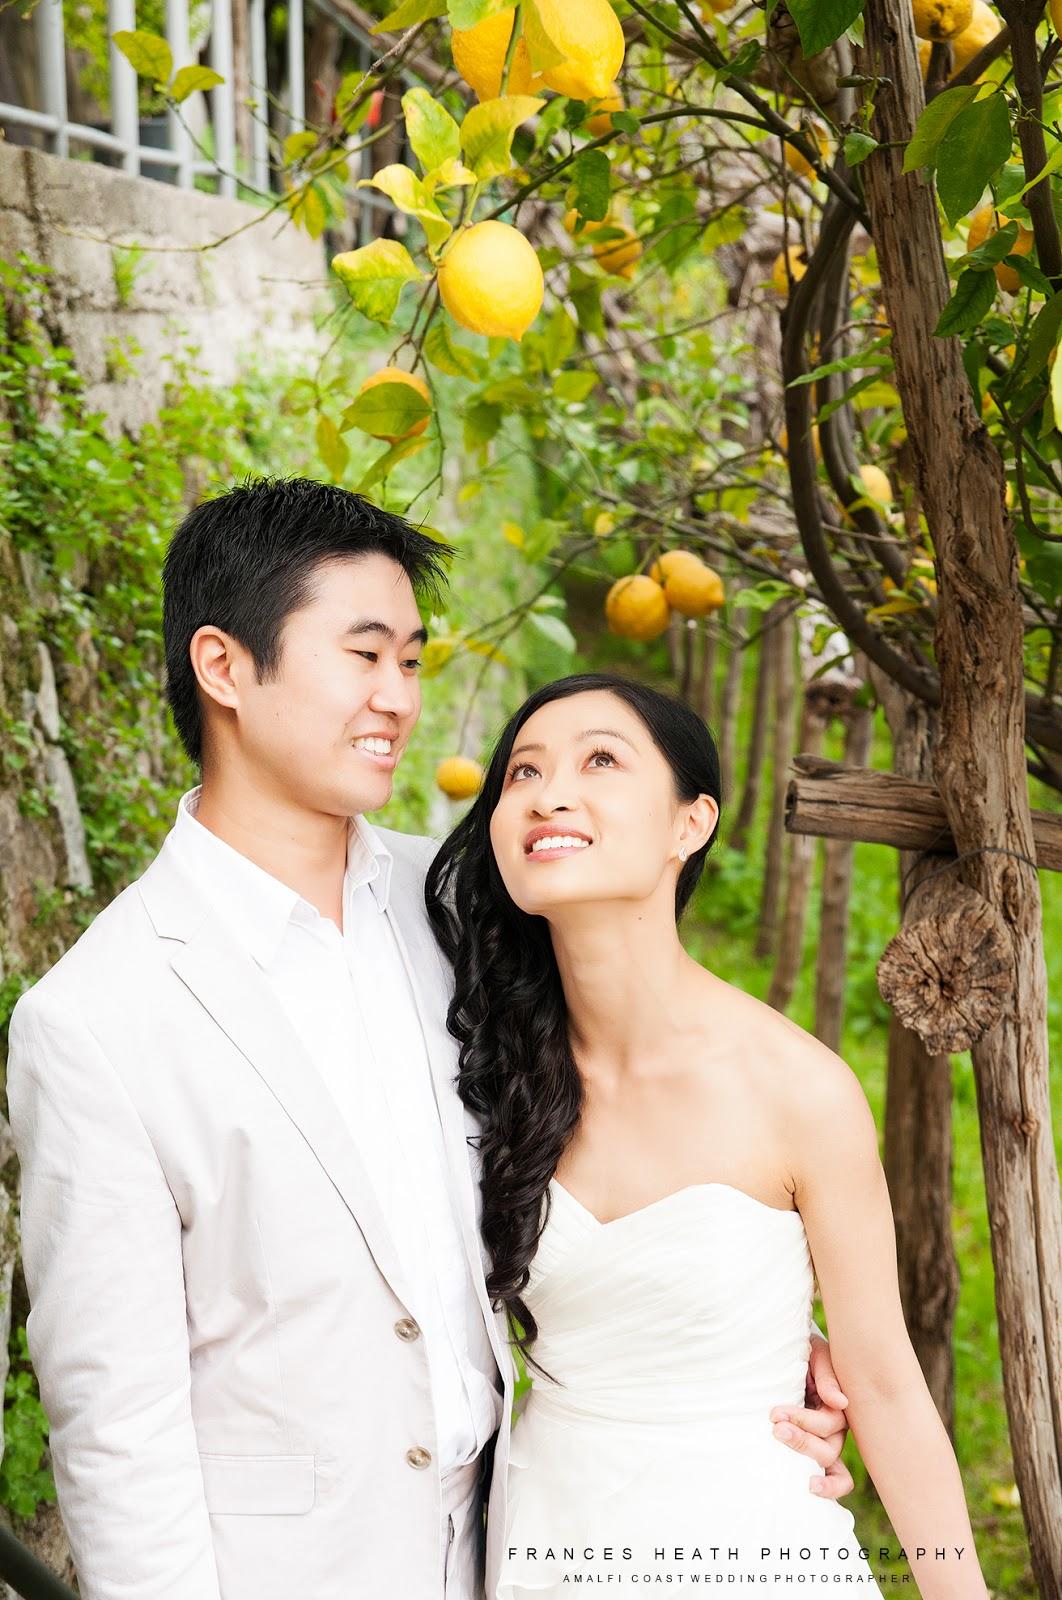 Wedding portrait in a lemon grove